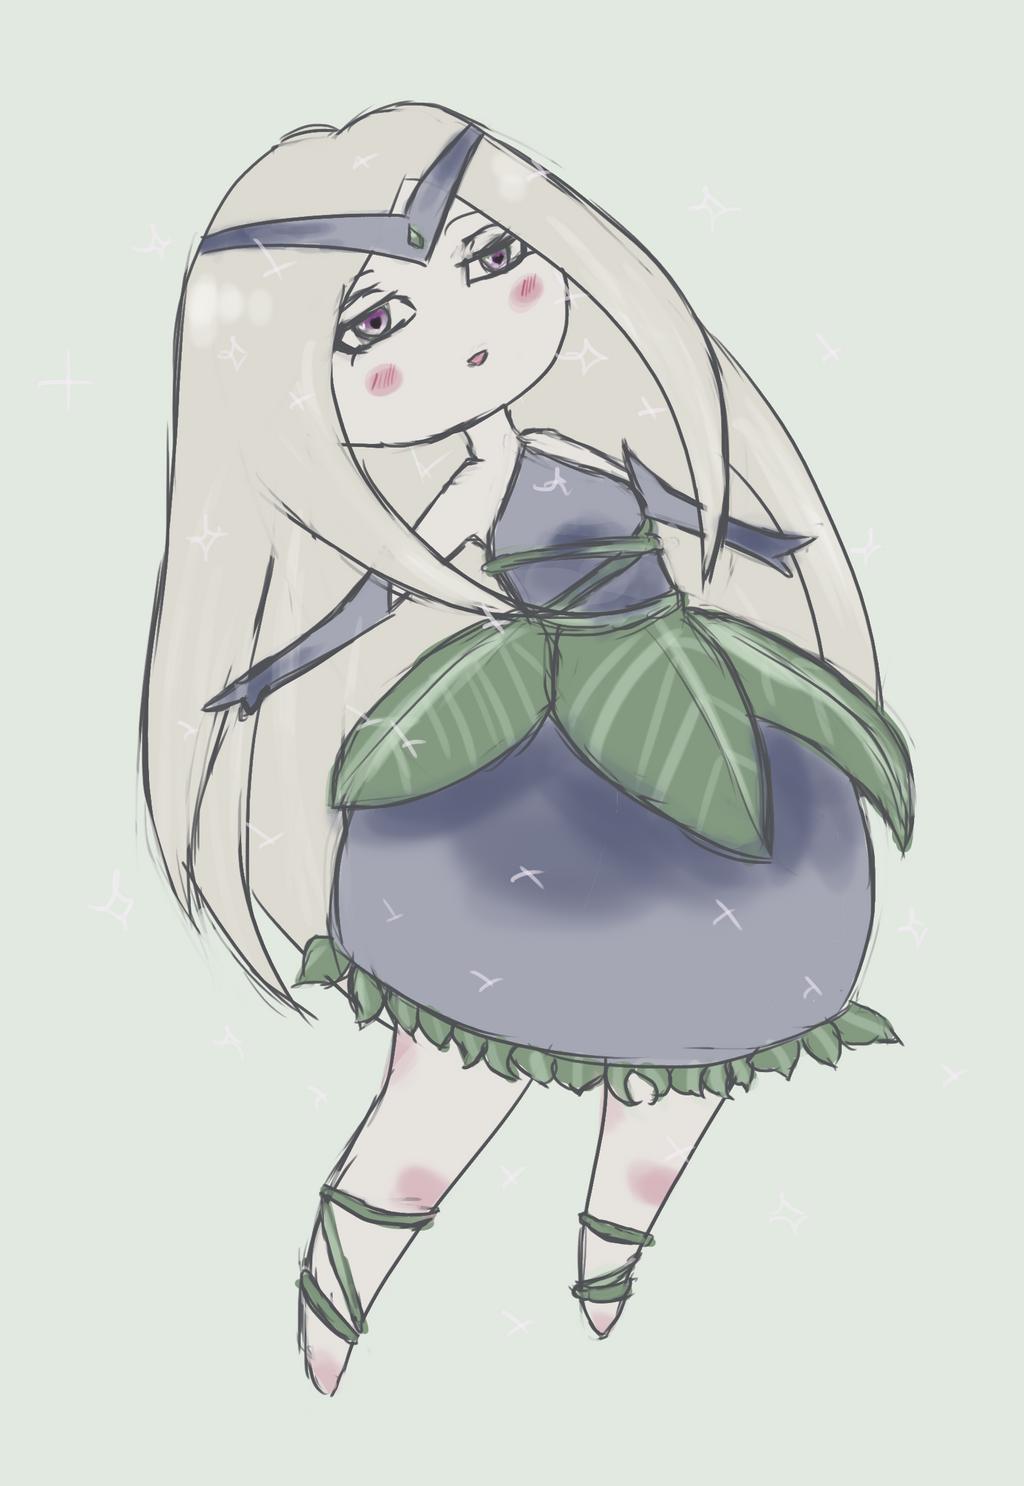 Magical Girl [Magical 30 Min Challenge] by Shiyatsu